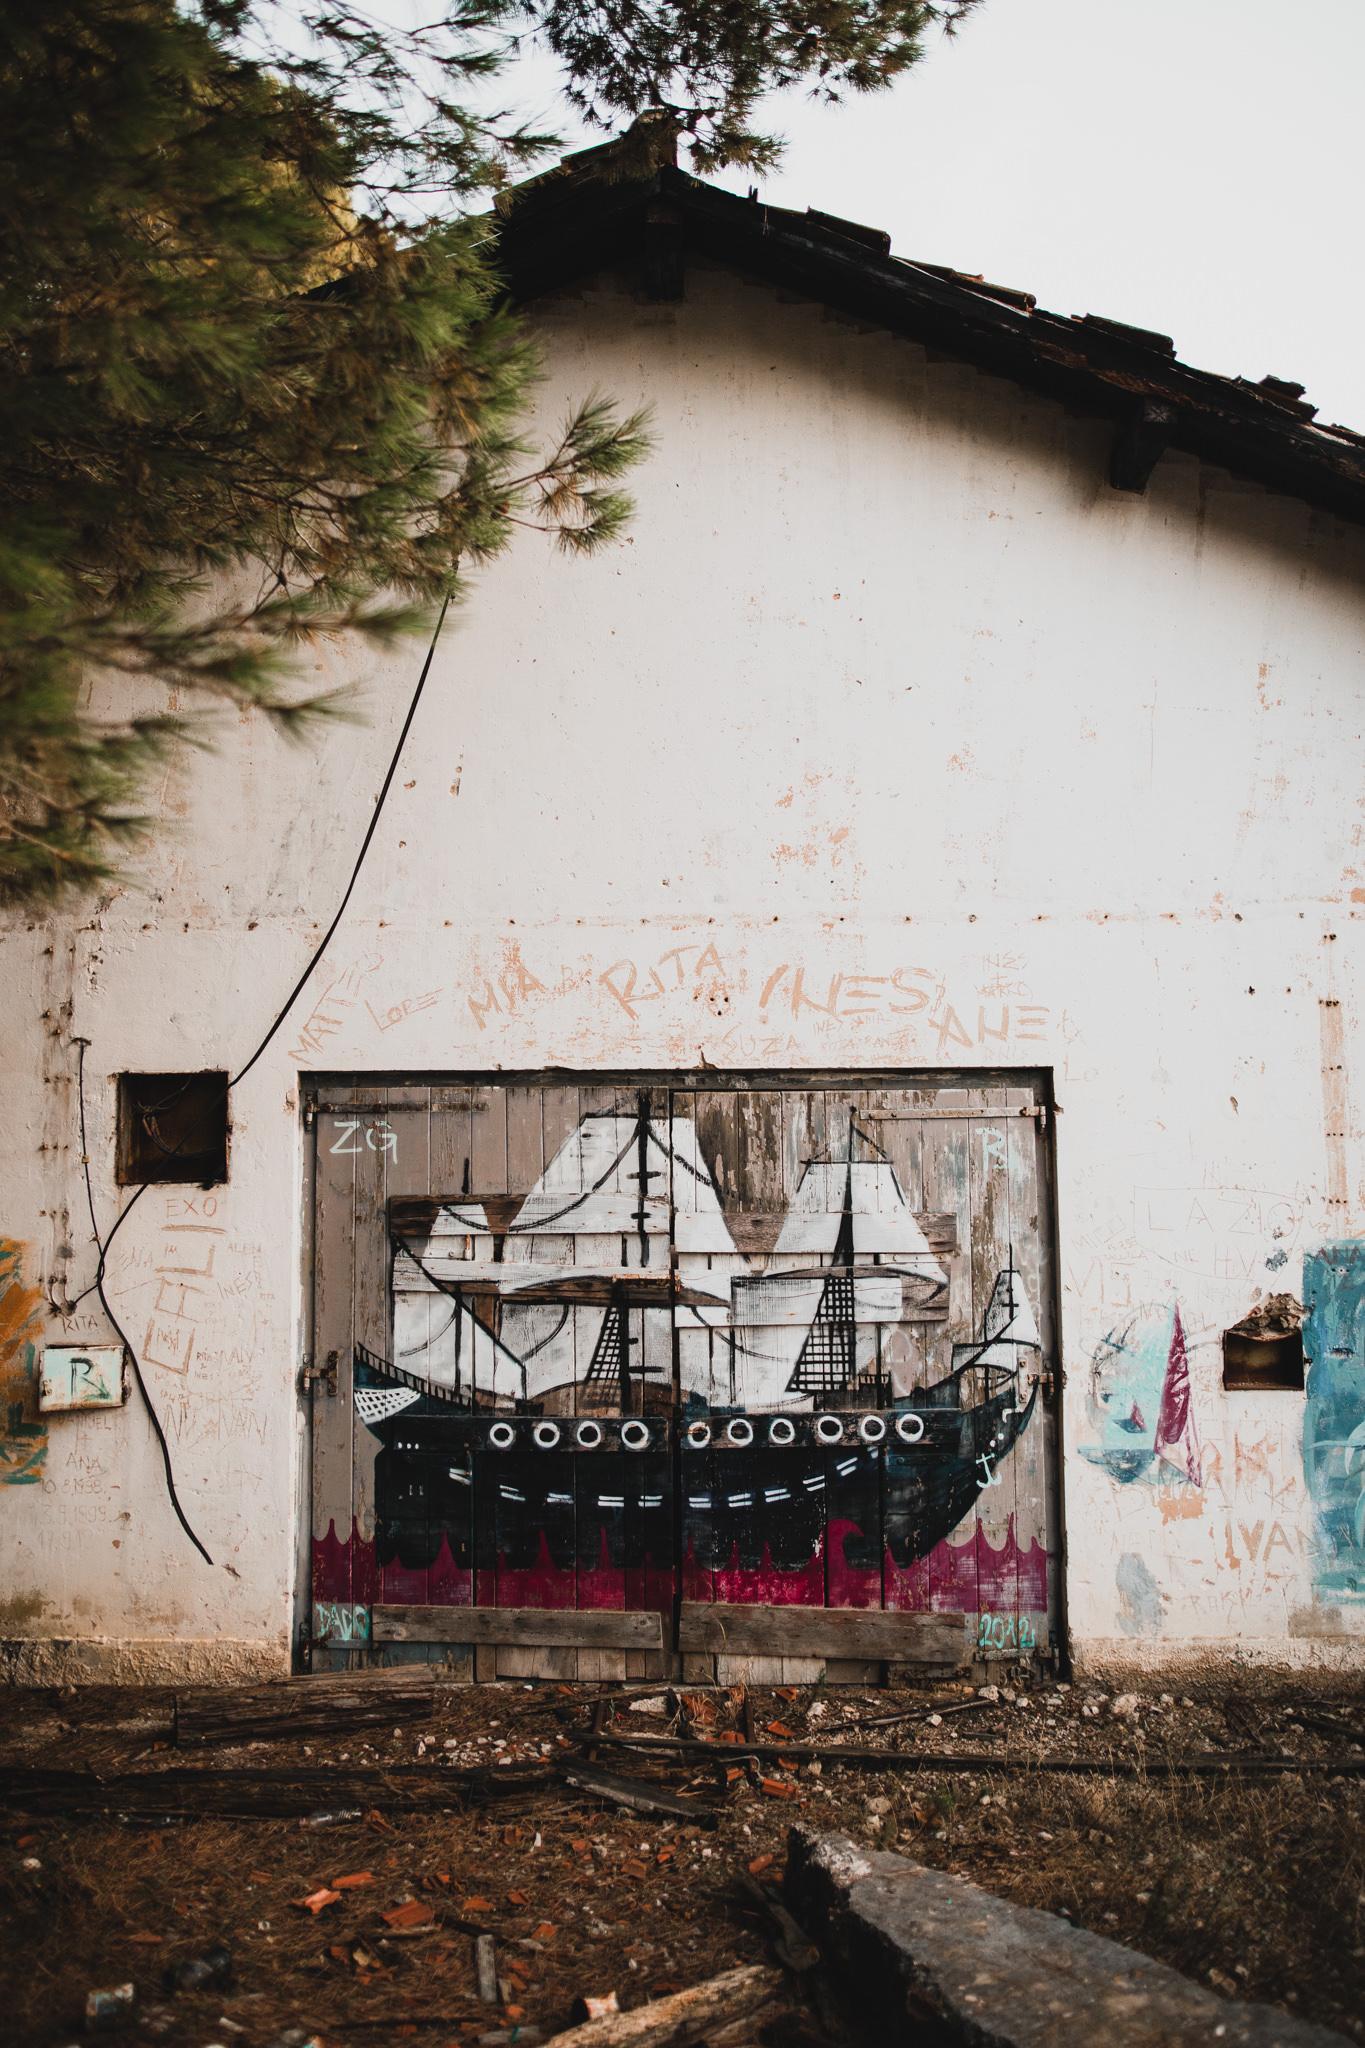 271-WEB-Jonathan-Kuhn-Photography-Croatia-1544.jpg